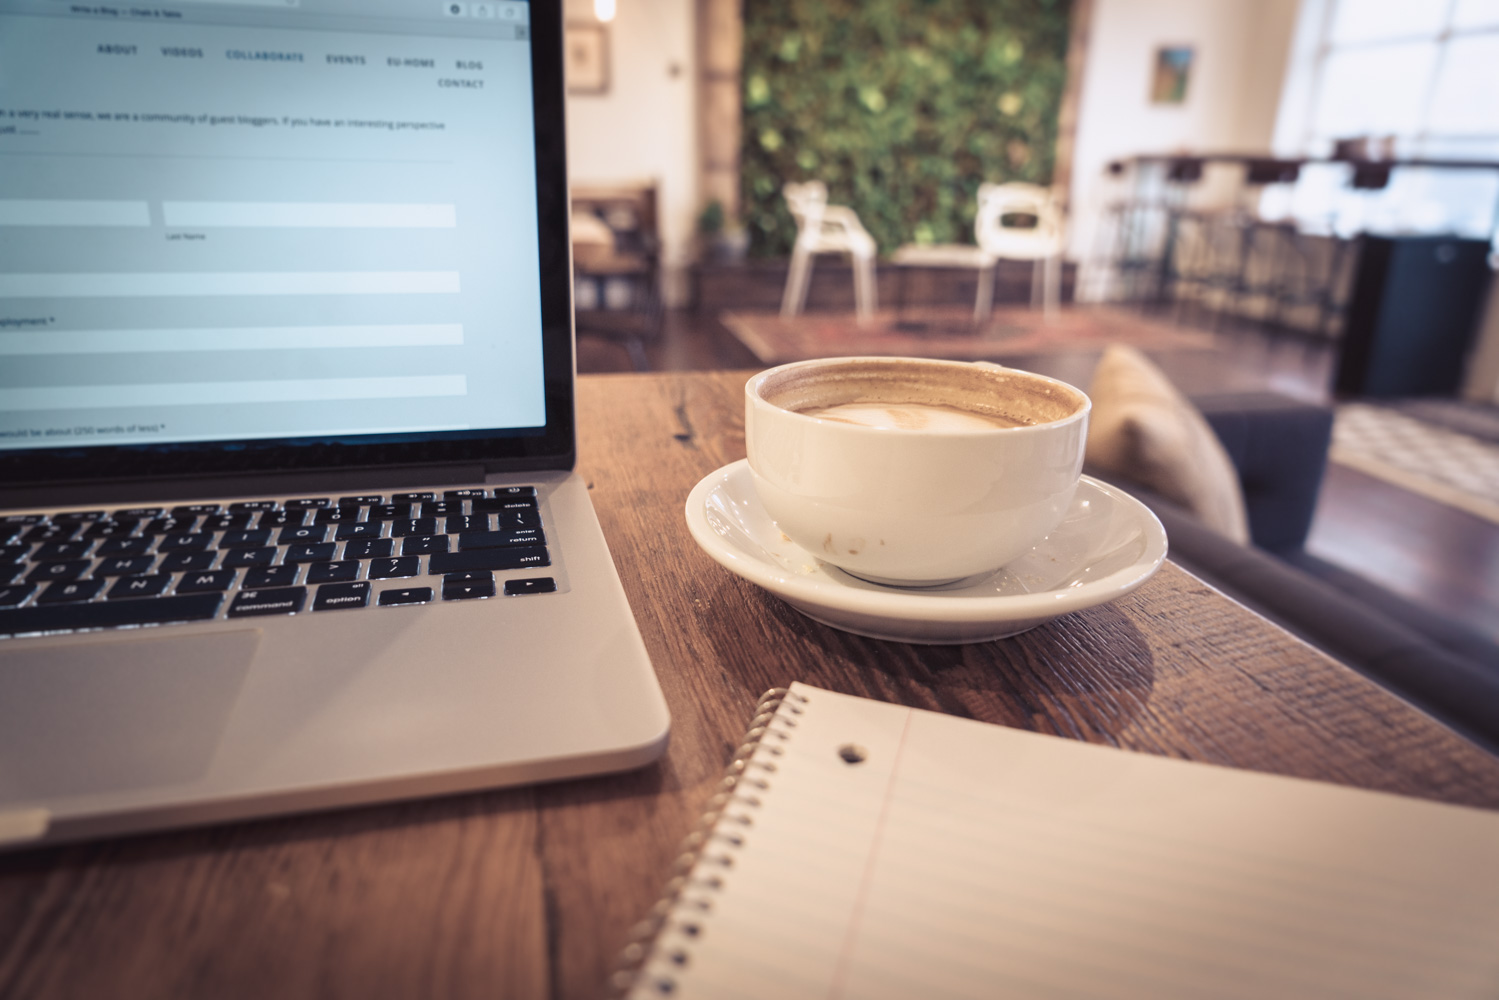 write a blog_2 (1 of 1).JPG